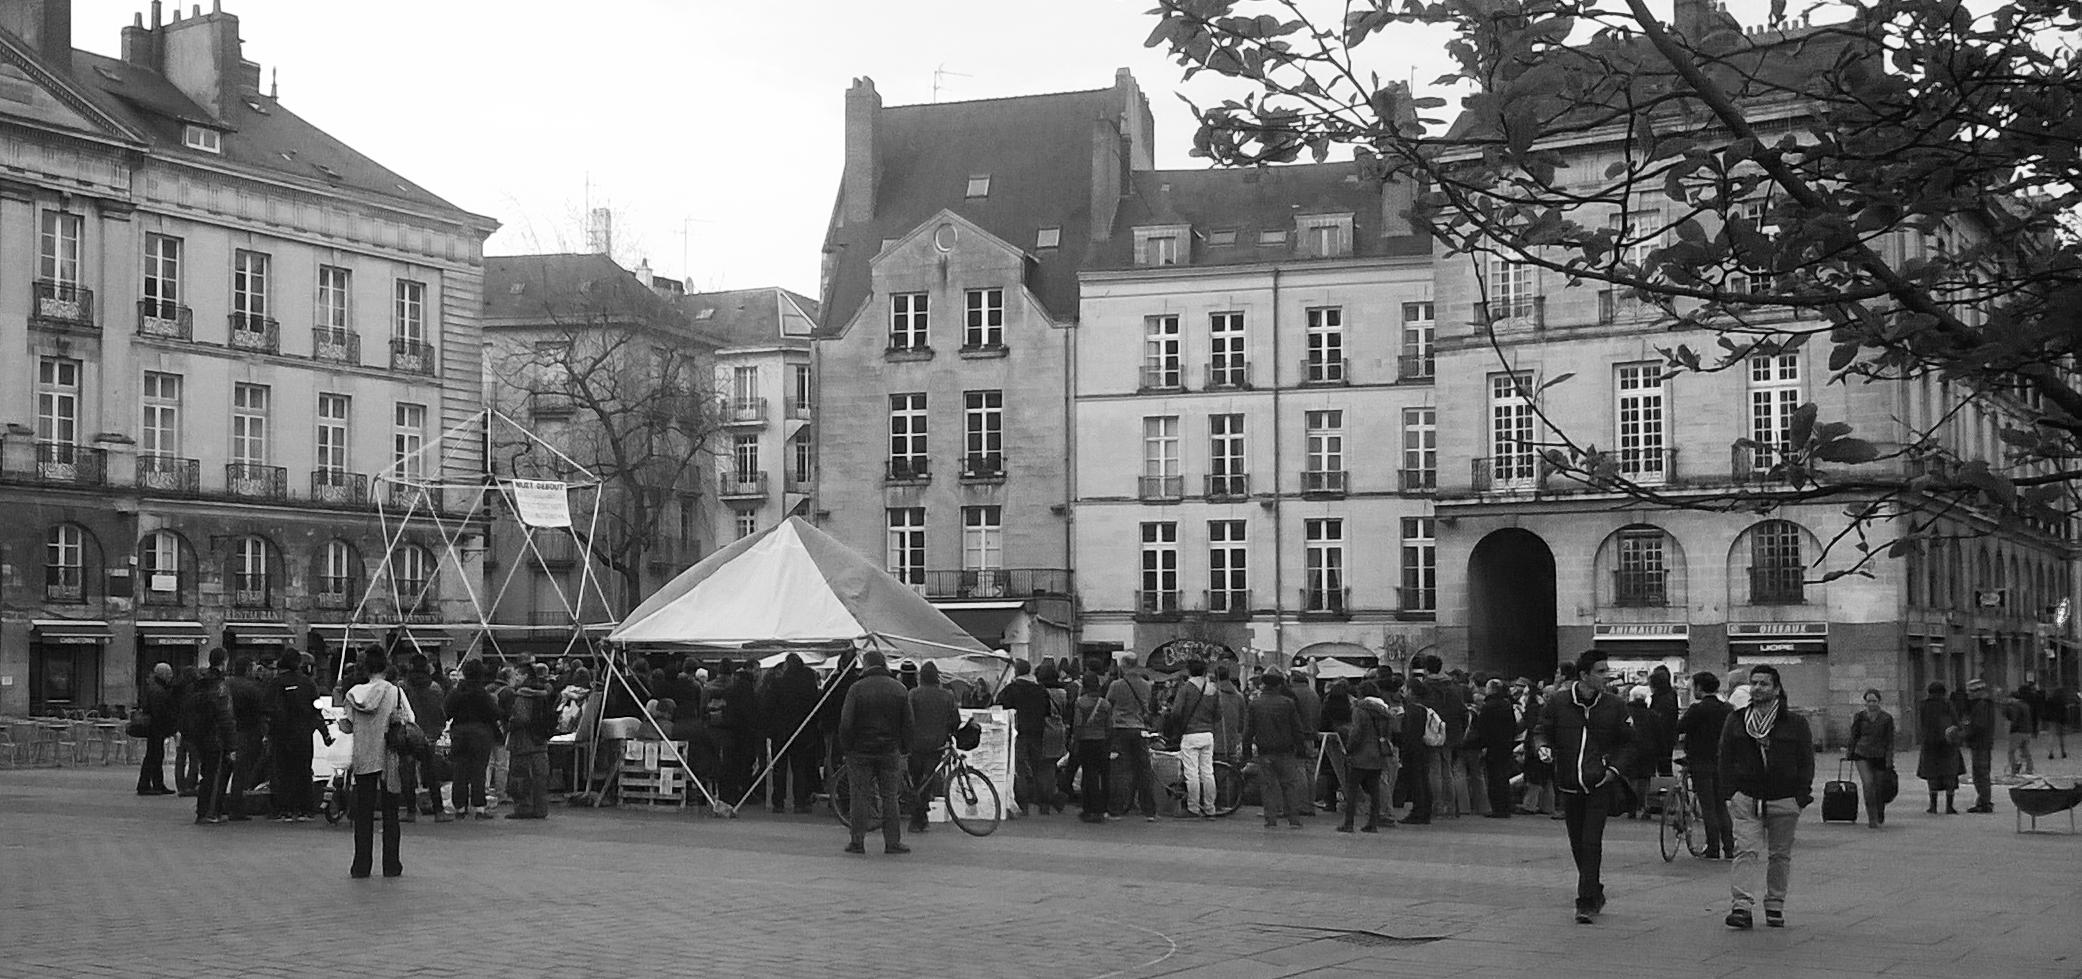 Nuit Debout Nantes_Article Manuel Bertrand_2016